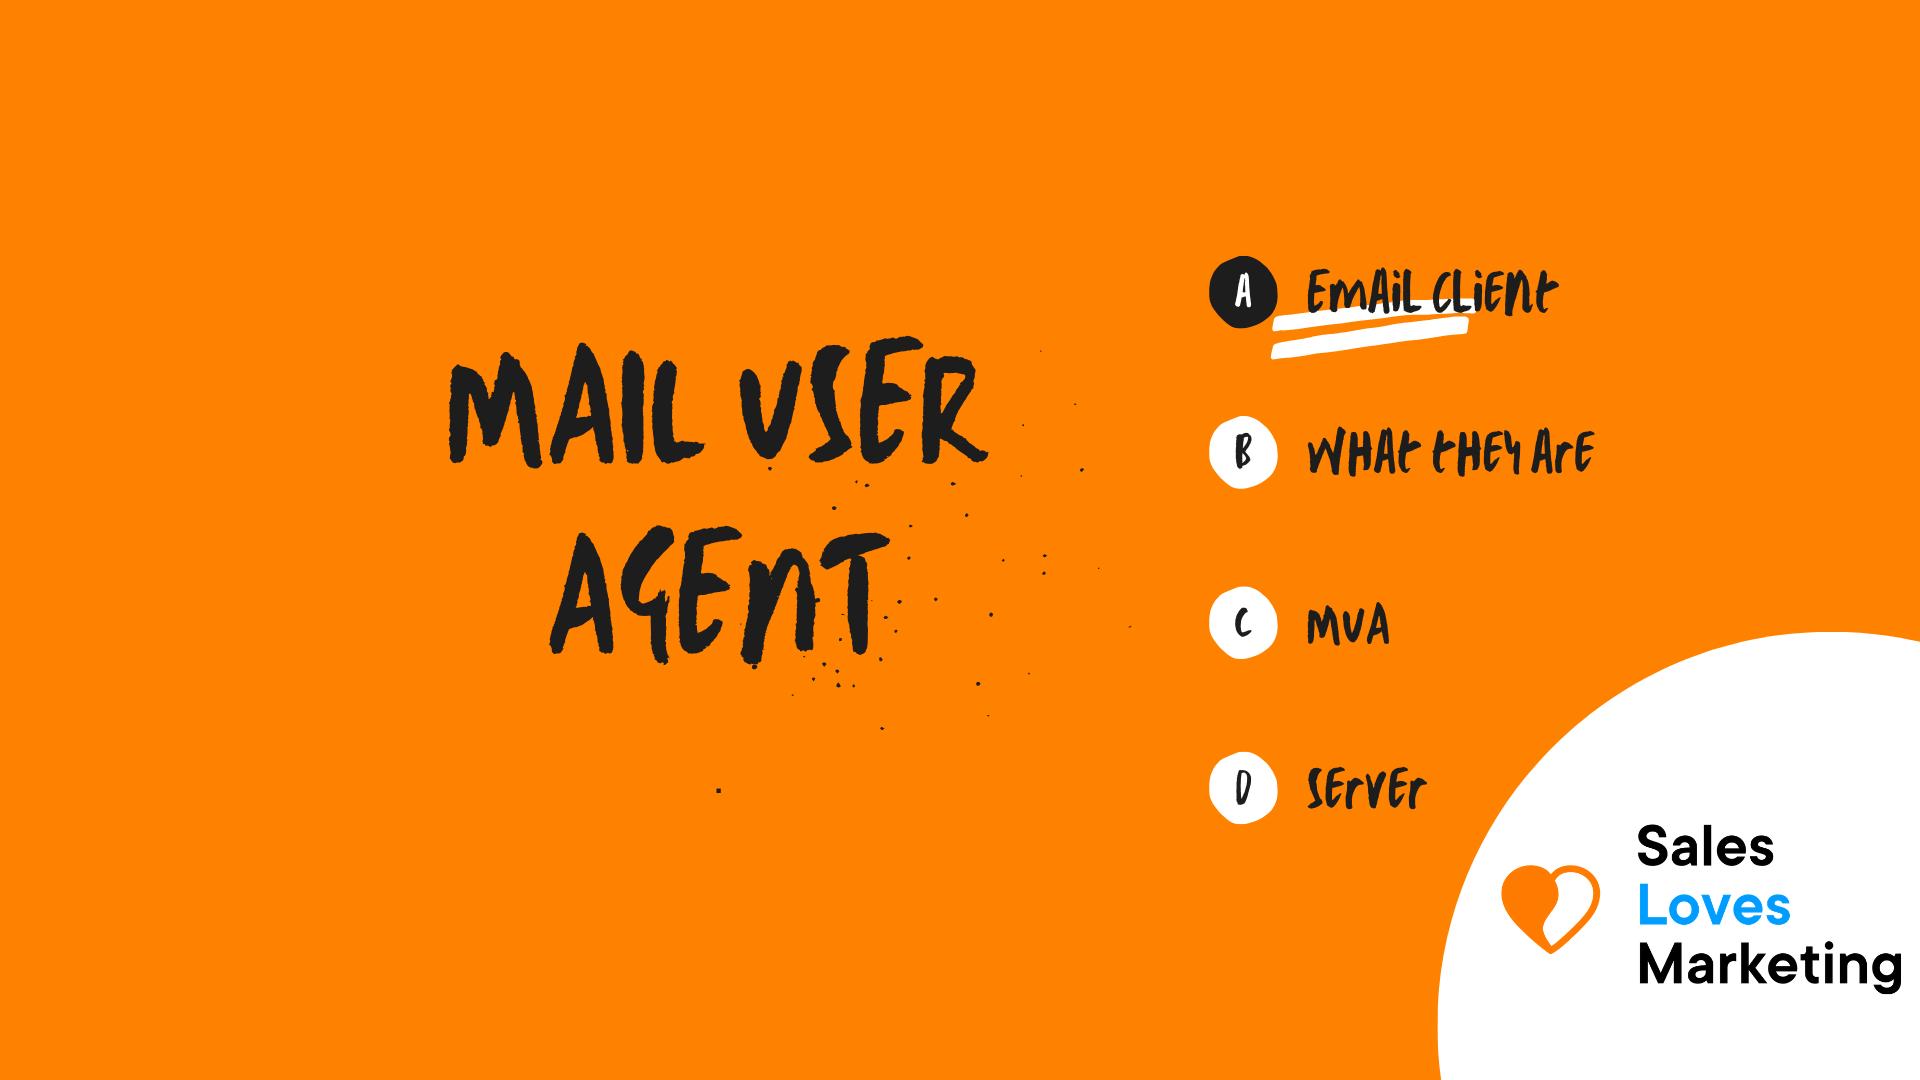 Mail User Agent (MUA)